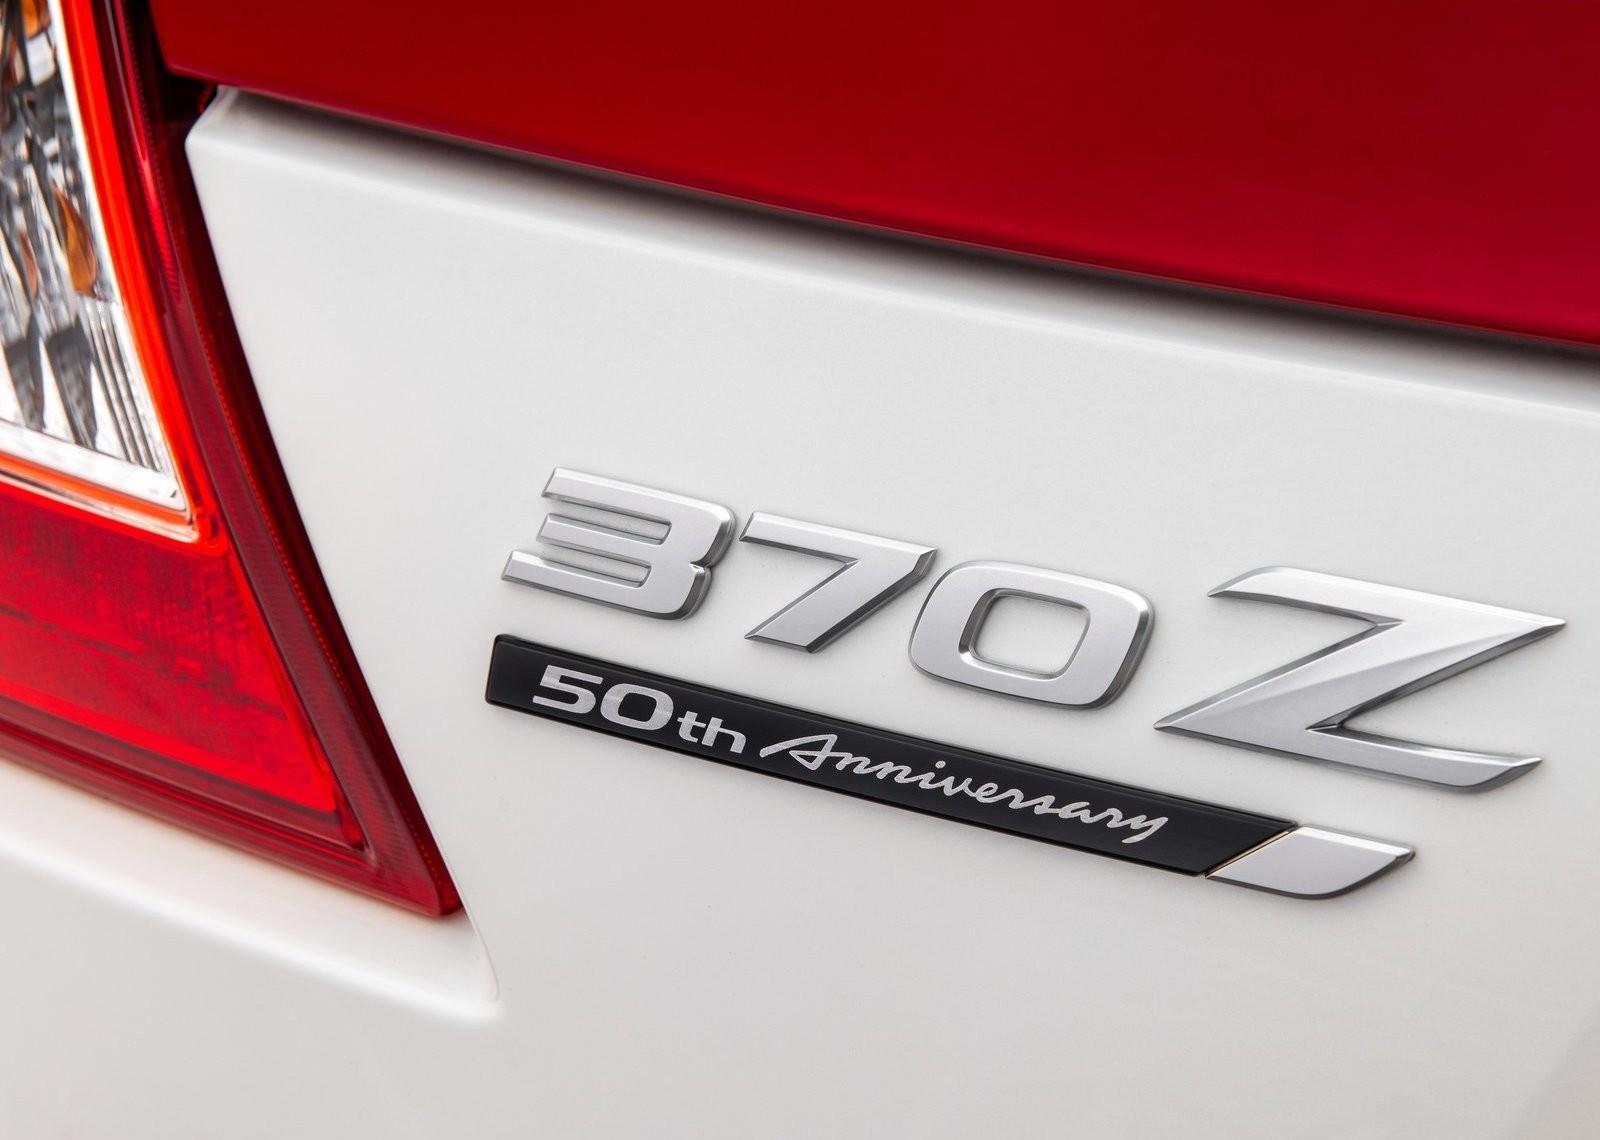 Foto de Nissan 370Z 50 aniversario (16/18)